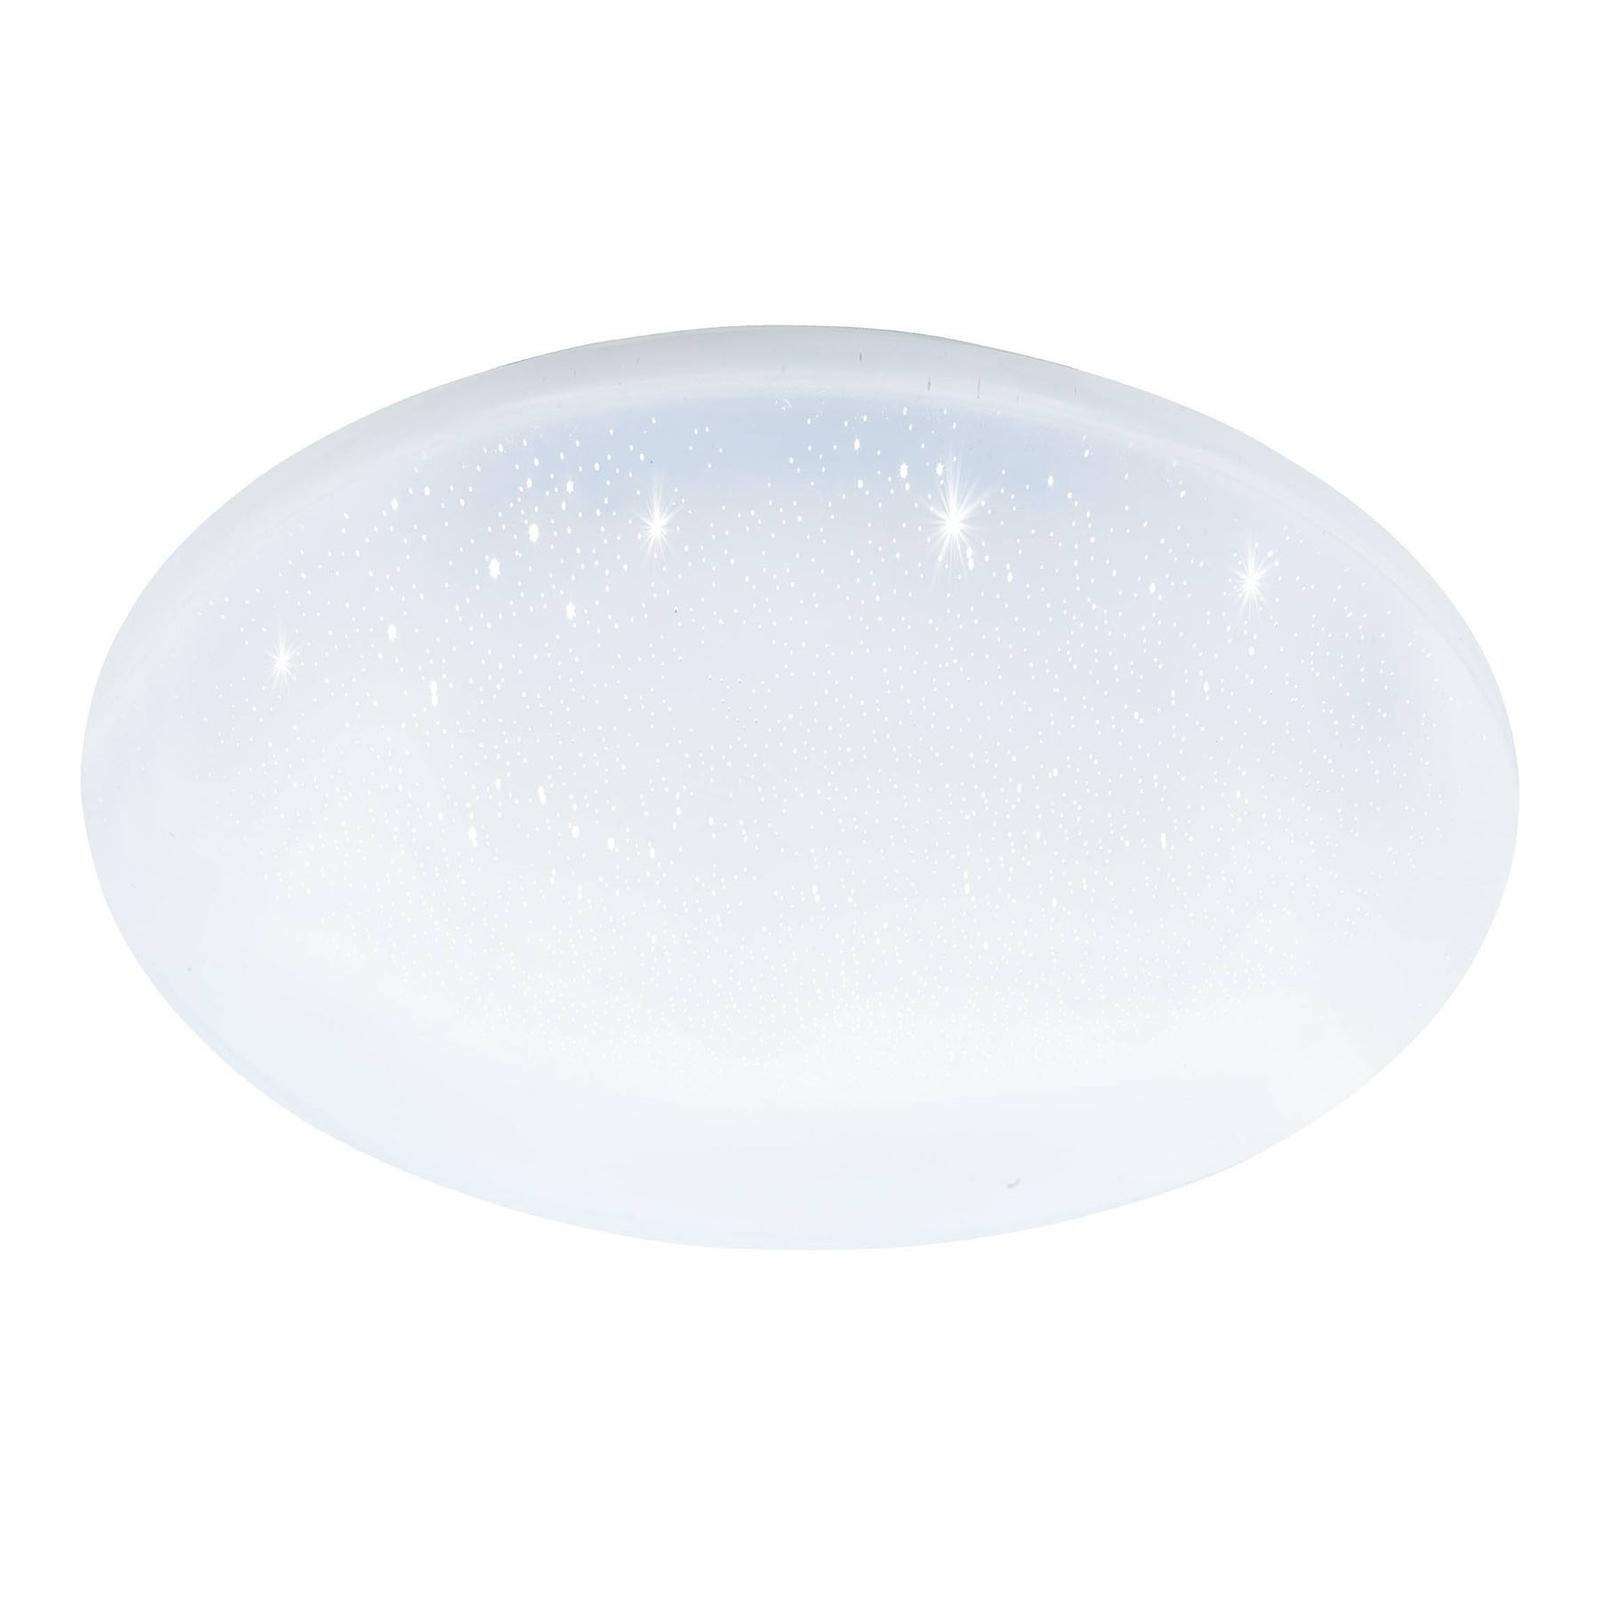 EGLO connect Totari-C krystall RGBW Ø 40 cm